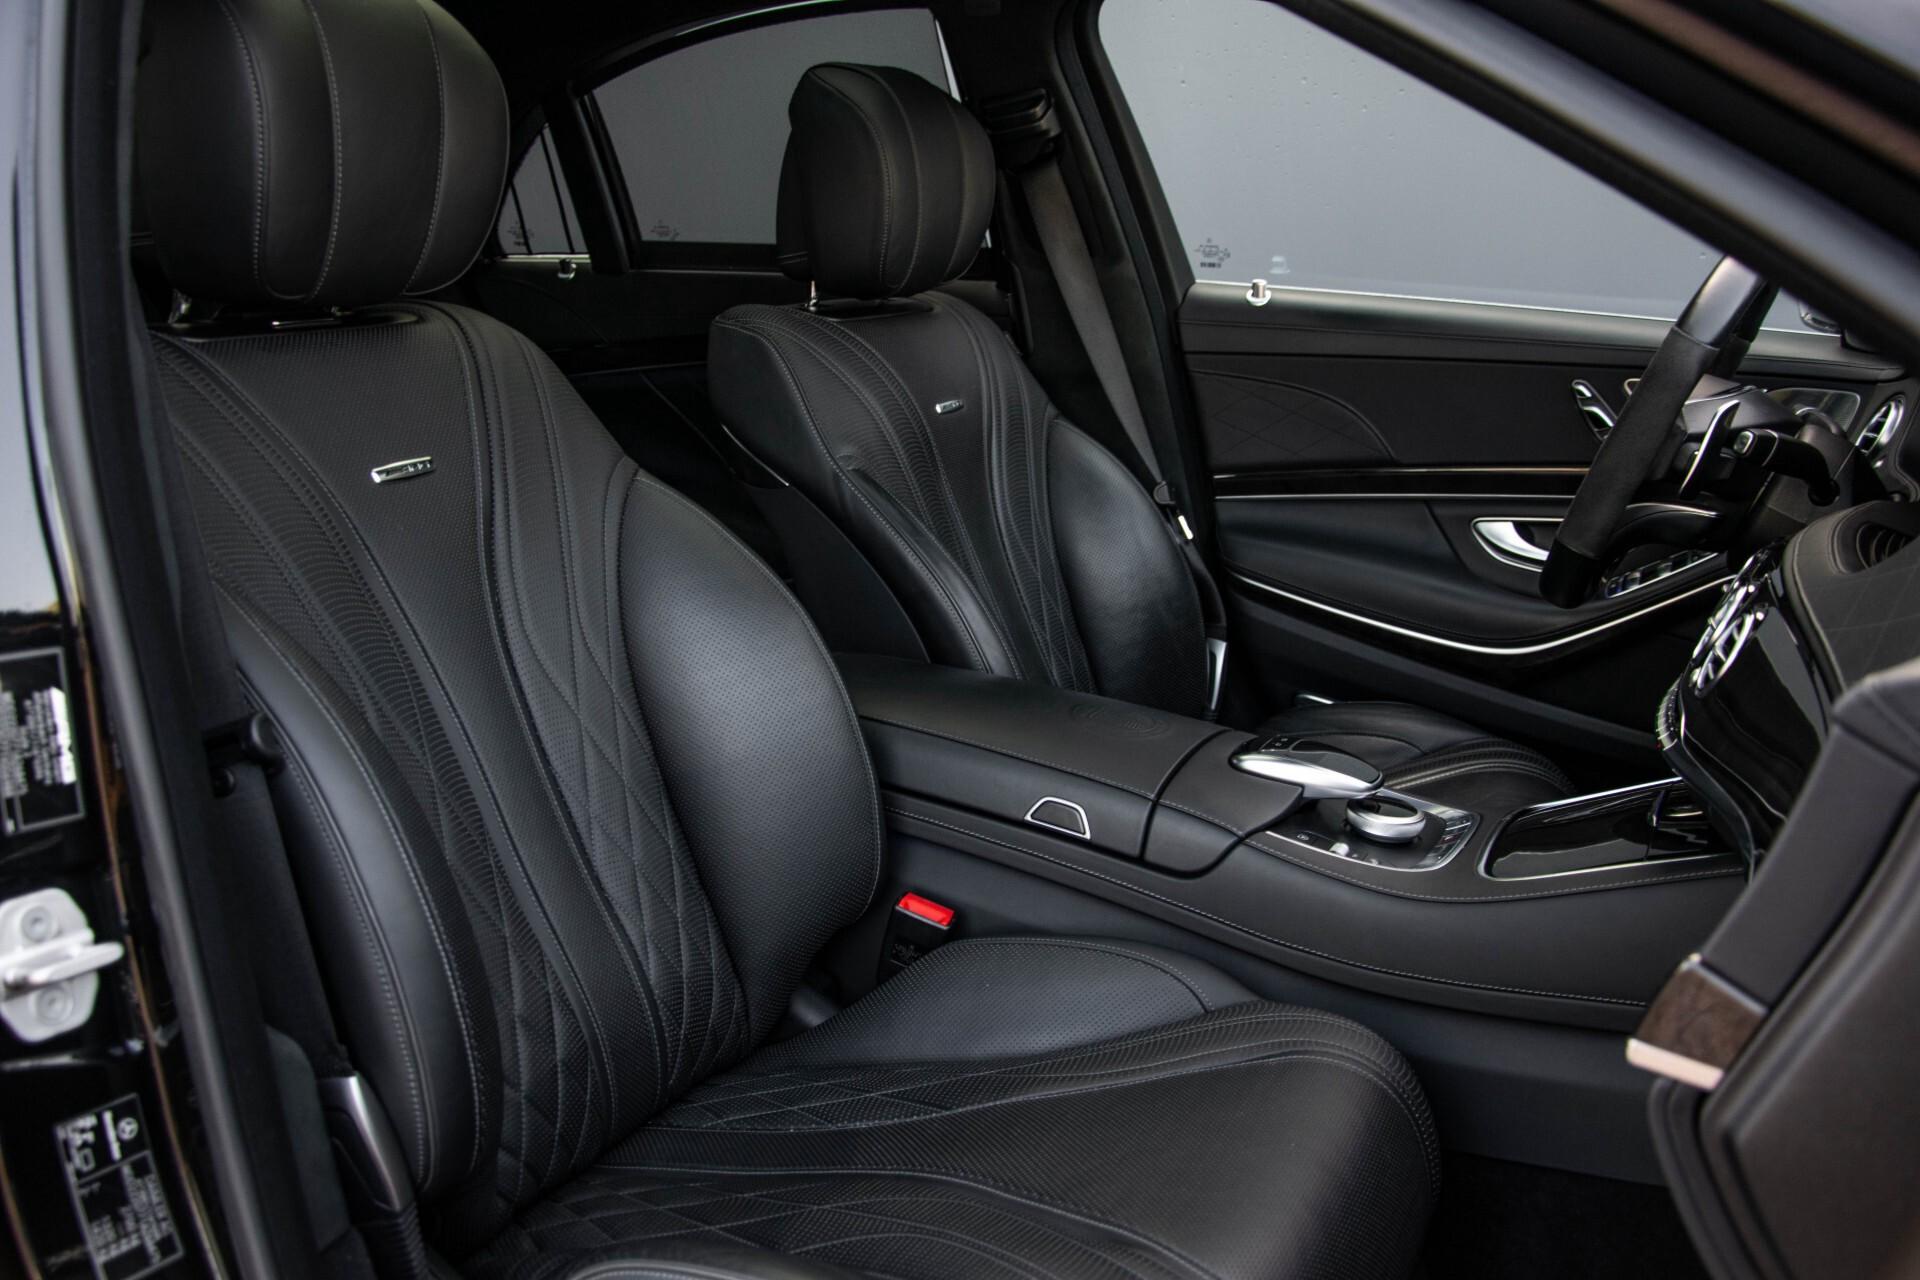 Mercedes-Benz S-Klasse 63 AMG Exclusive/Burmester High-End/Driverspack Aut7 Foto 3